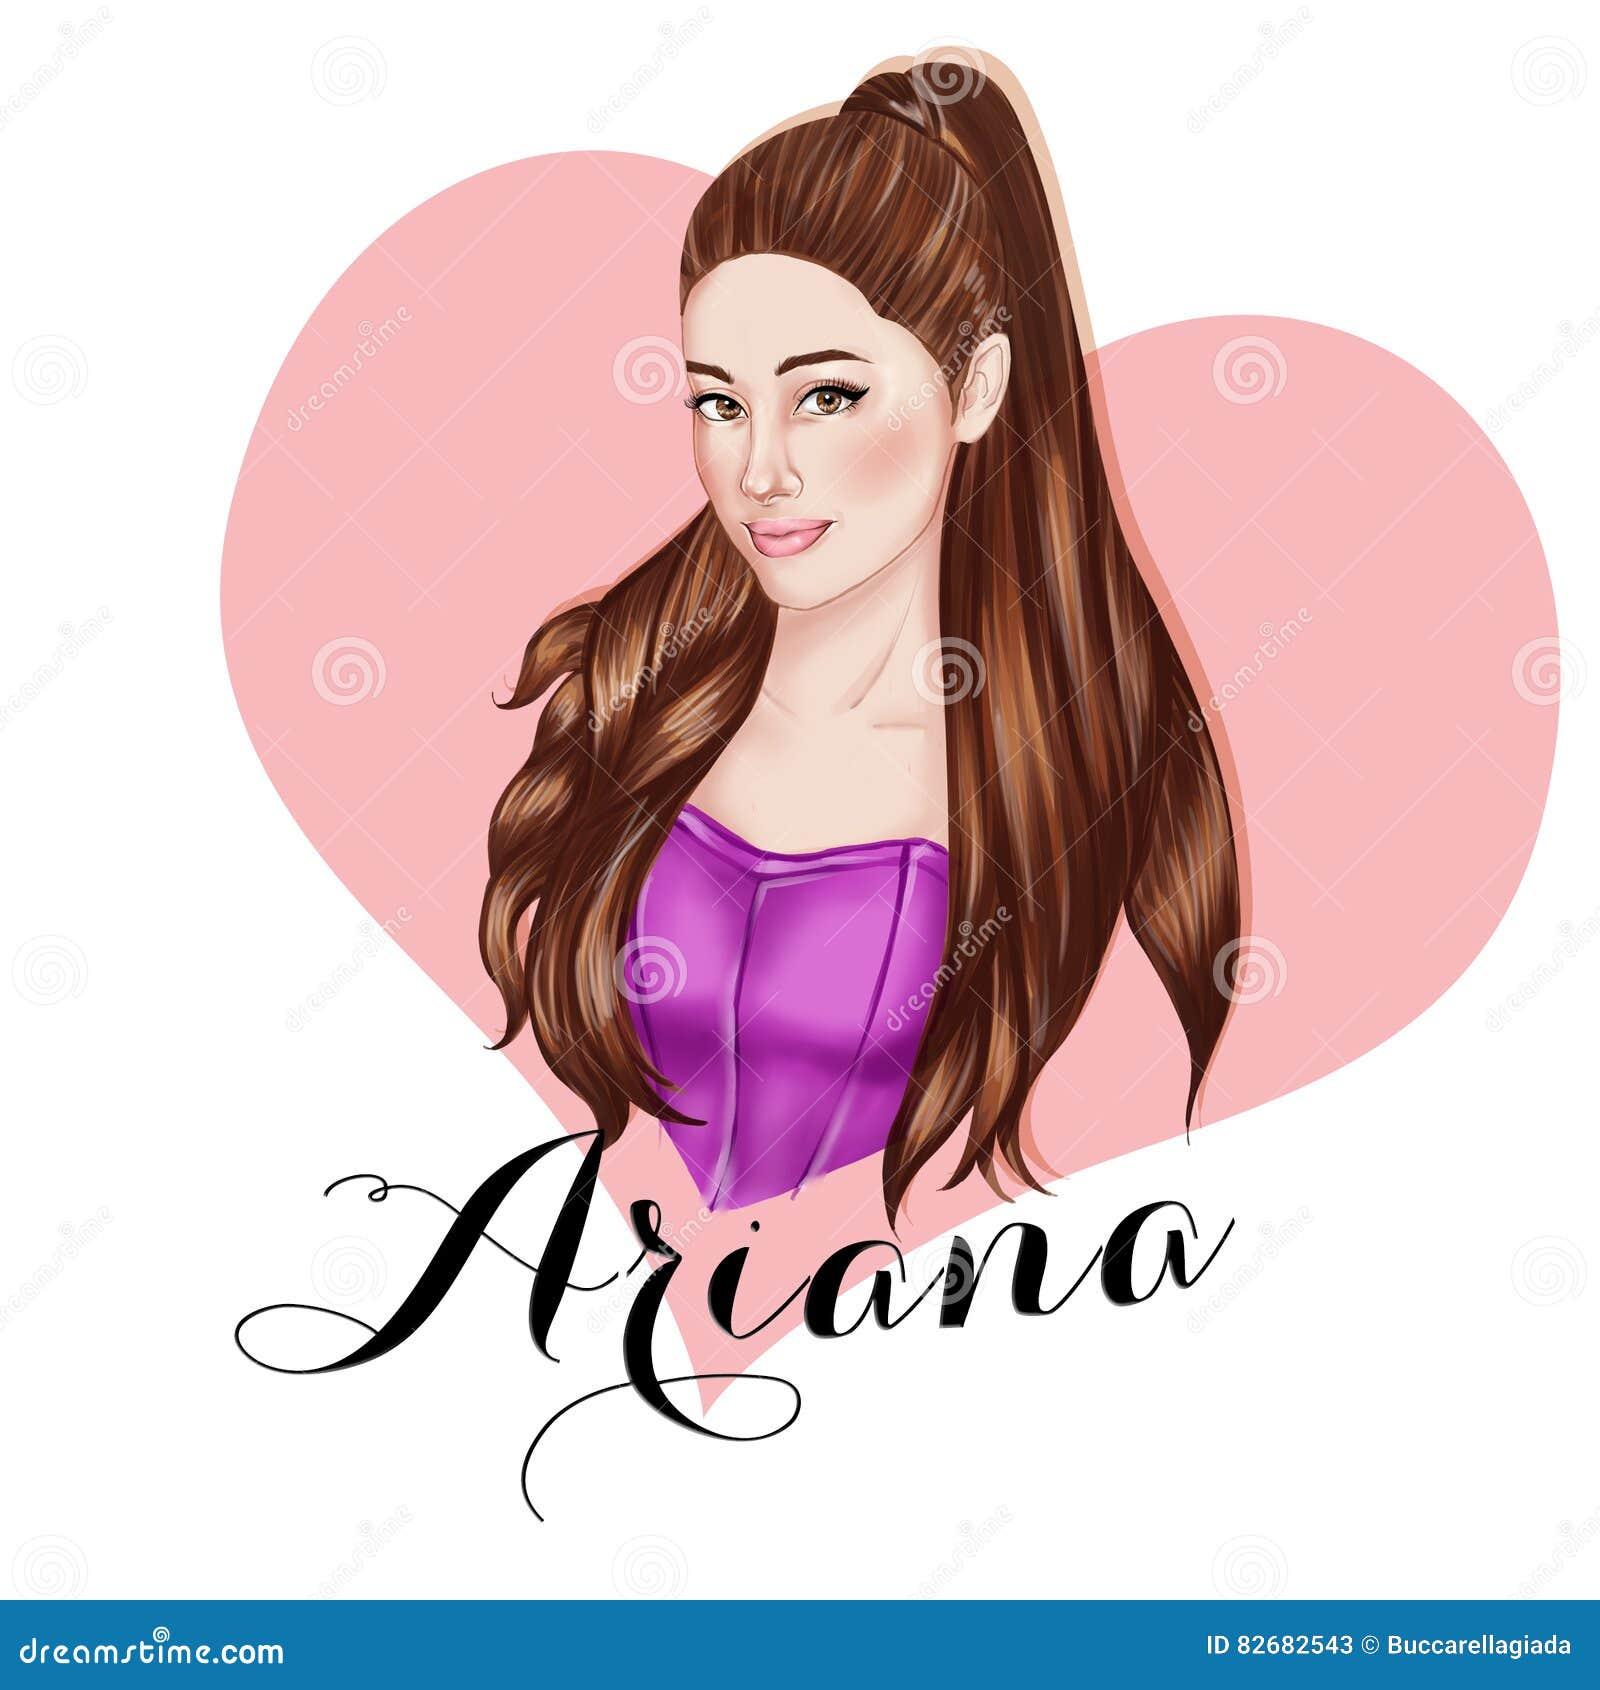 Illustration hand drawn portrait of singer ariana grande